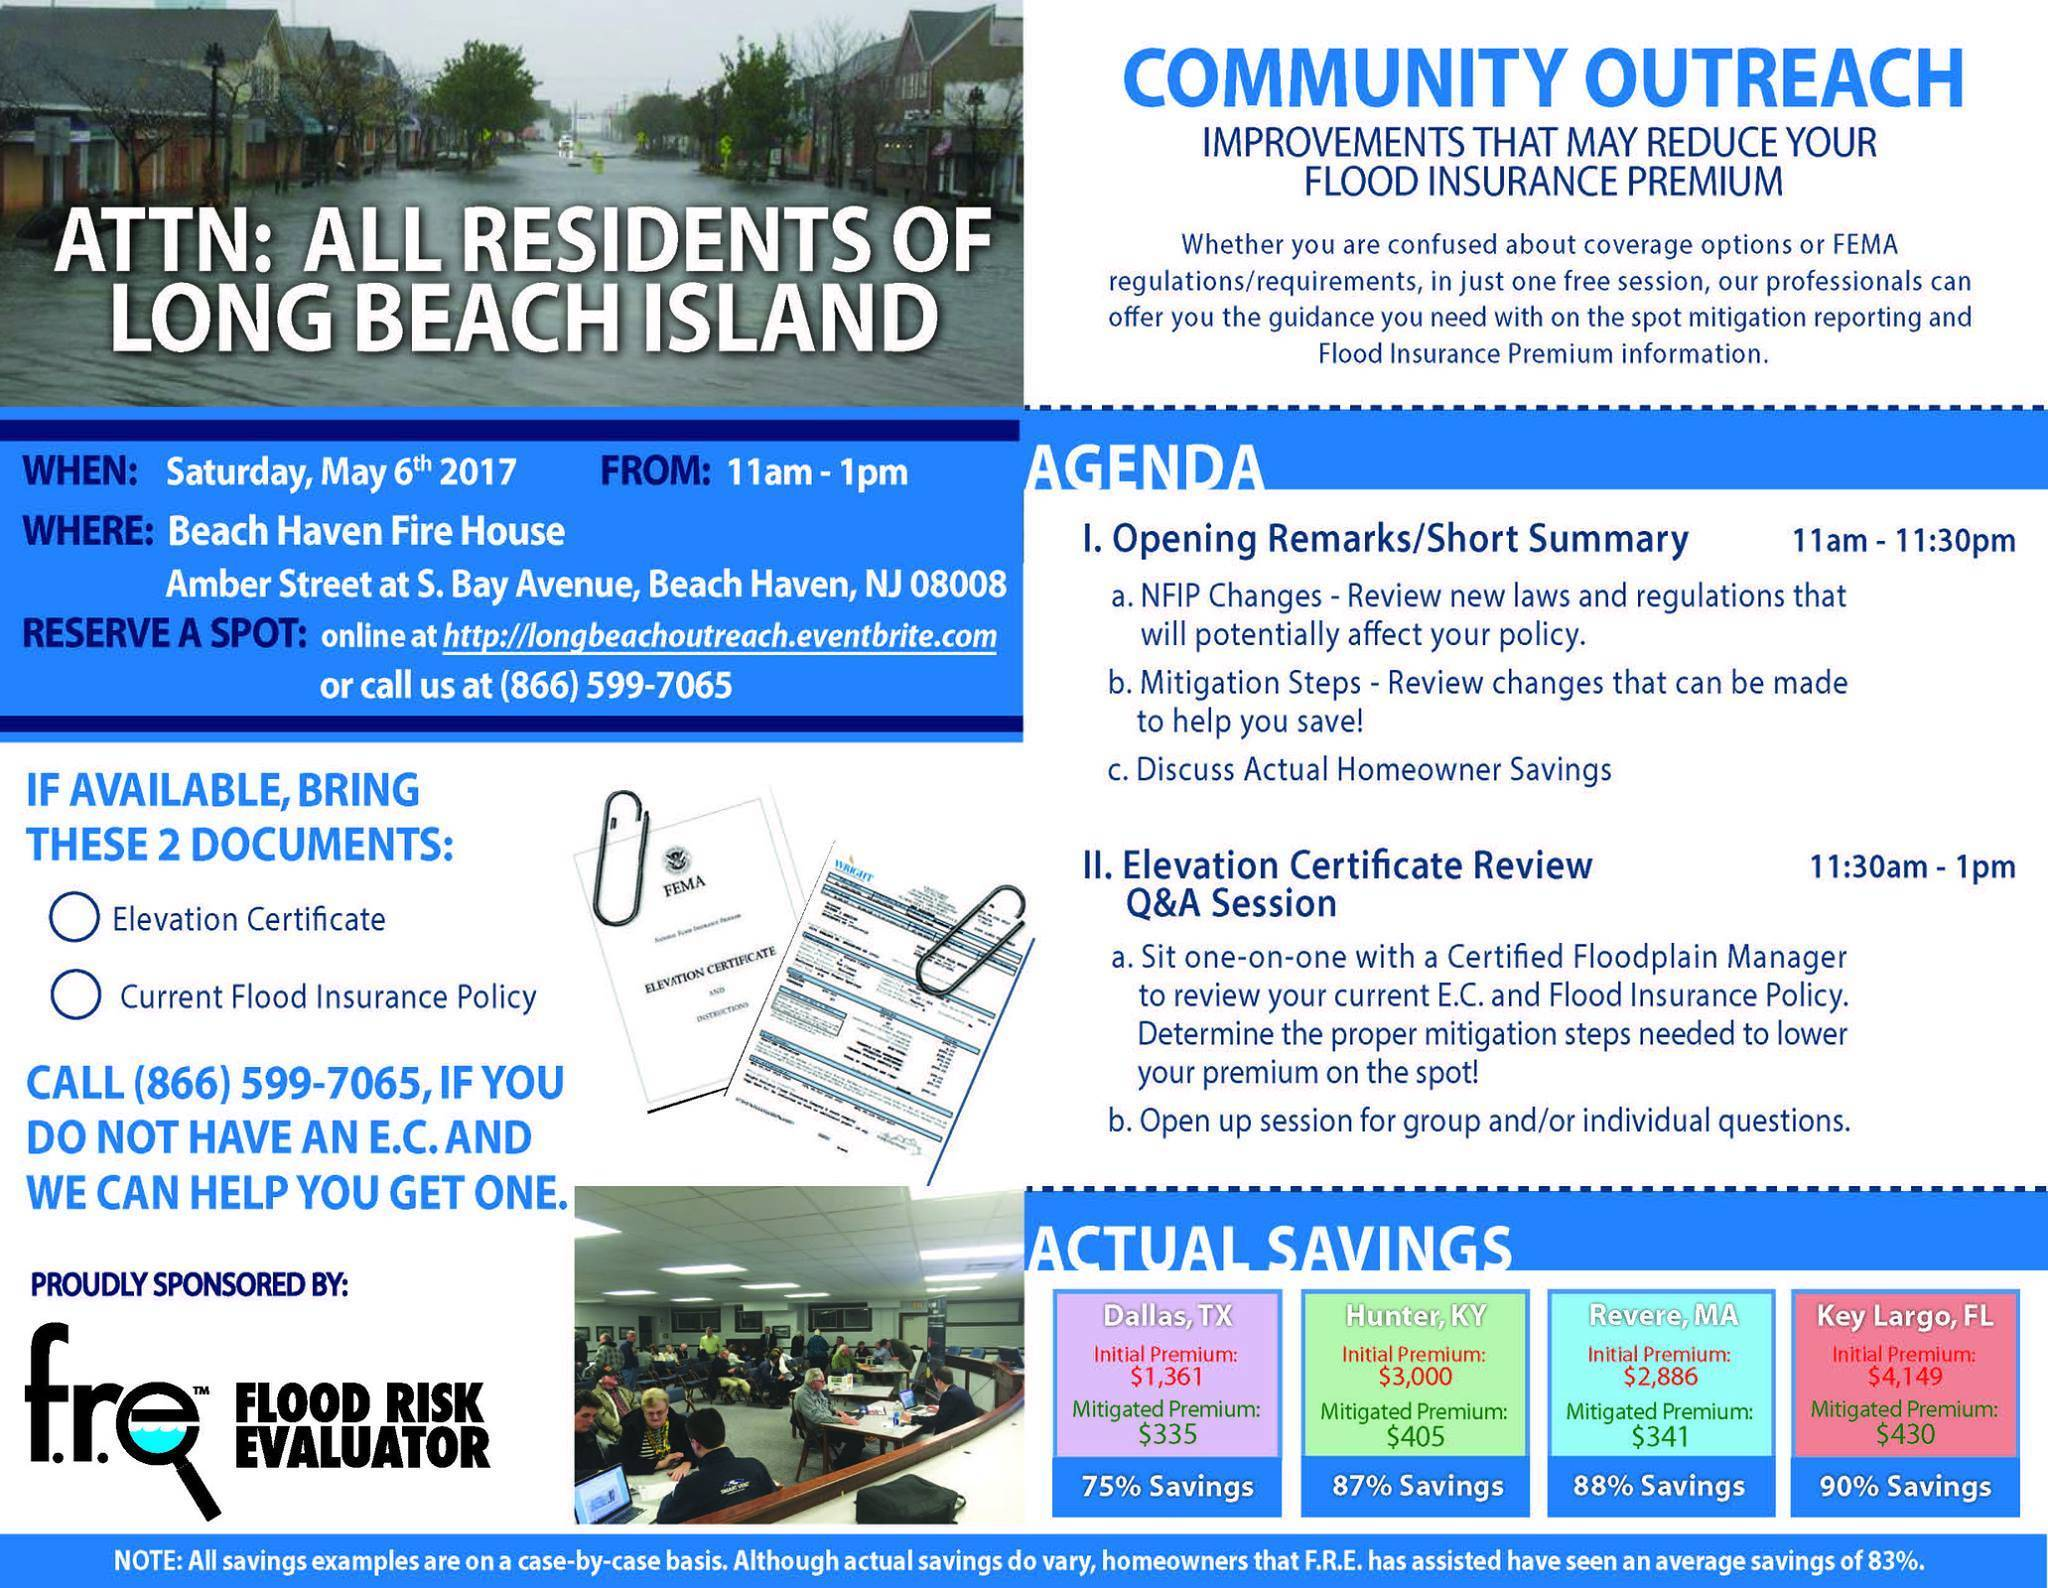 12340ae79a5385d0c6fc_beach_haven_emergency_management.jpg